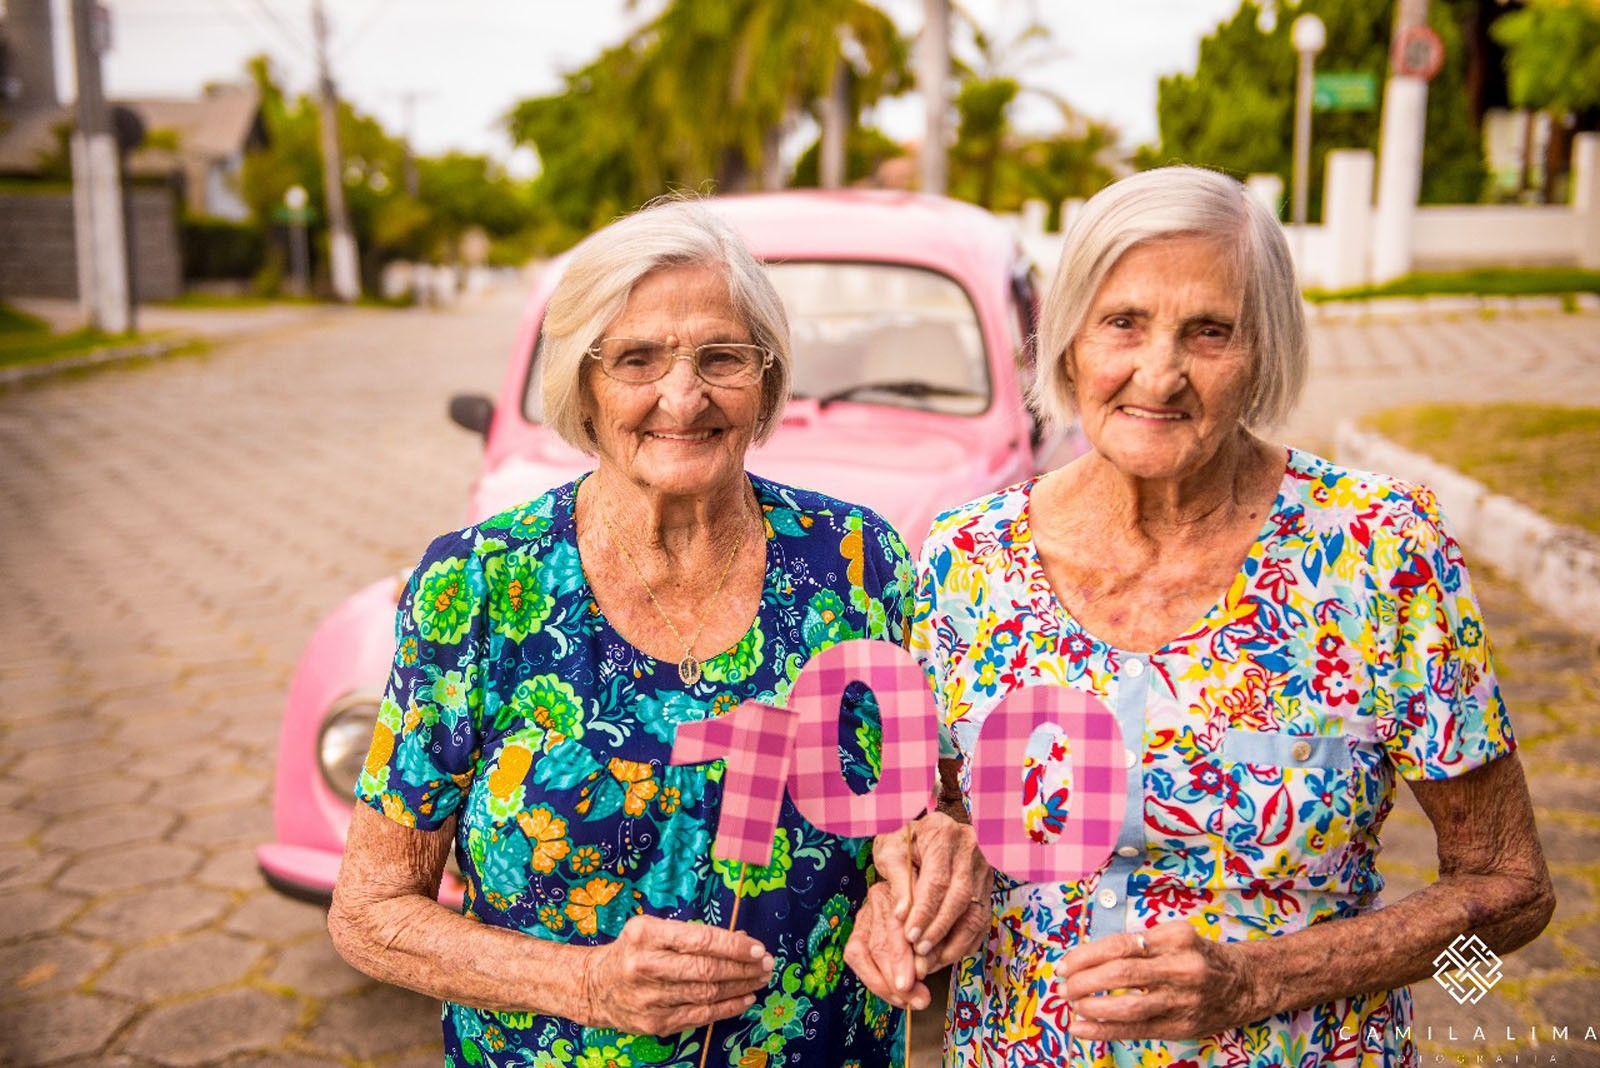 aniversário gêmeas 100 anos